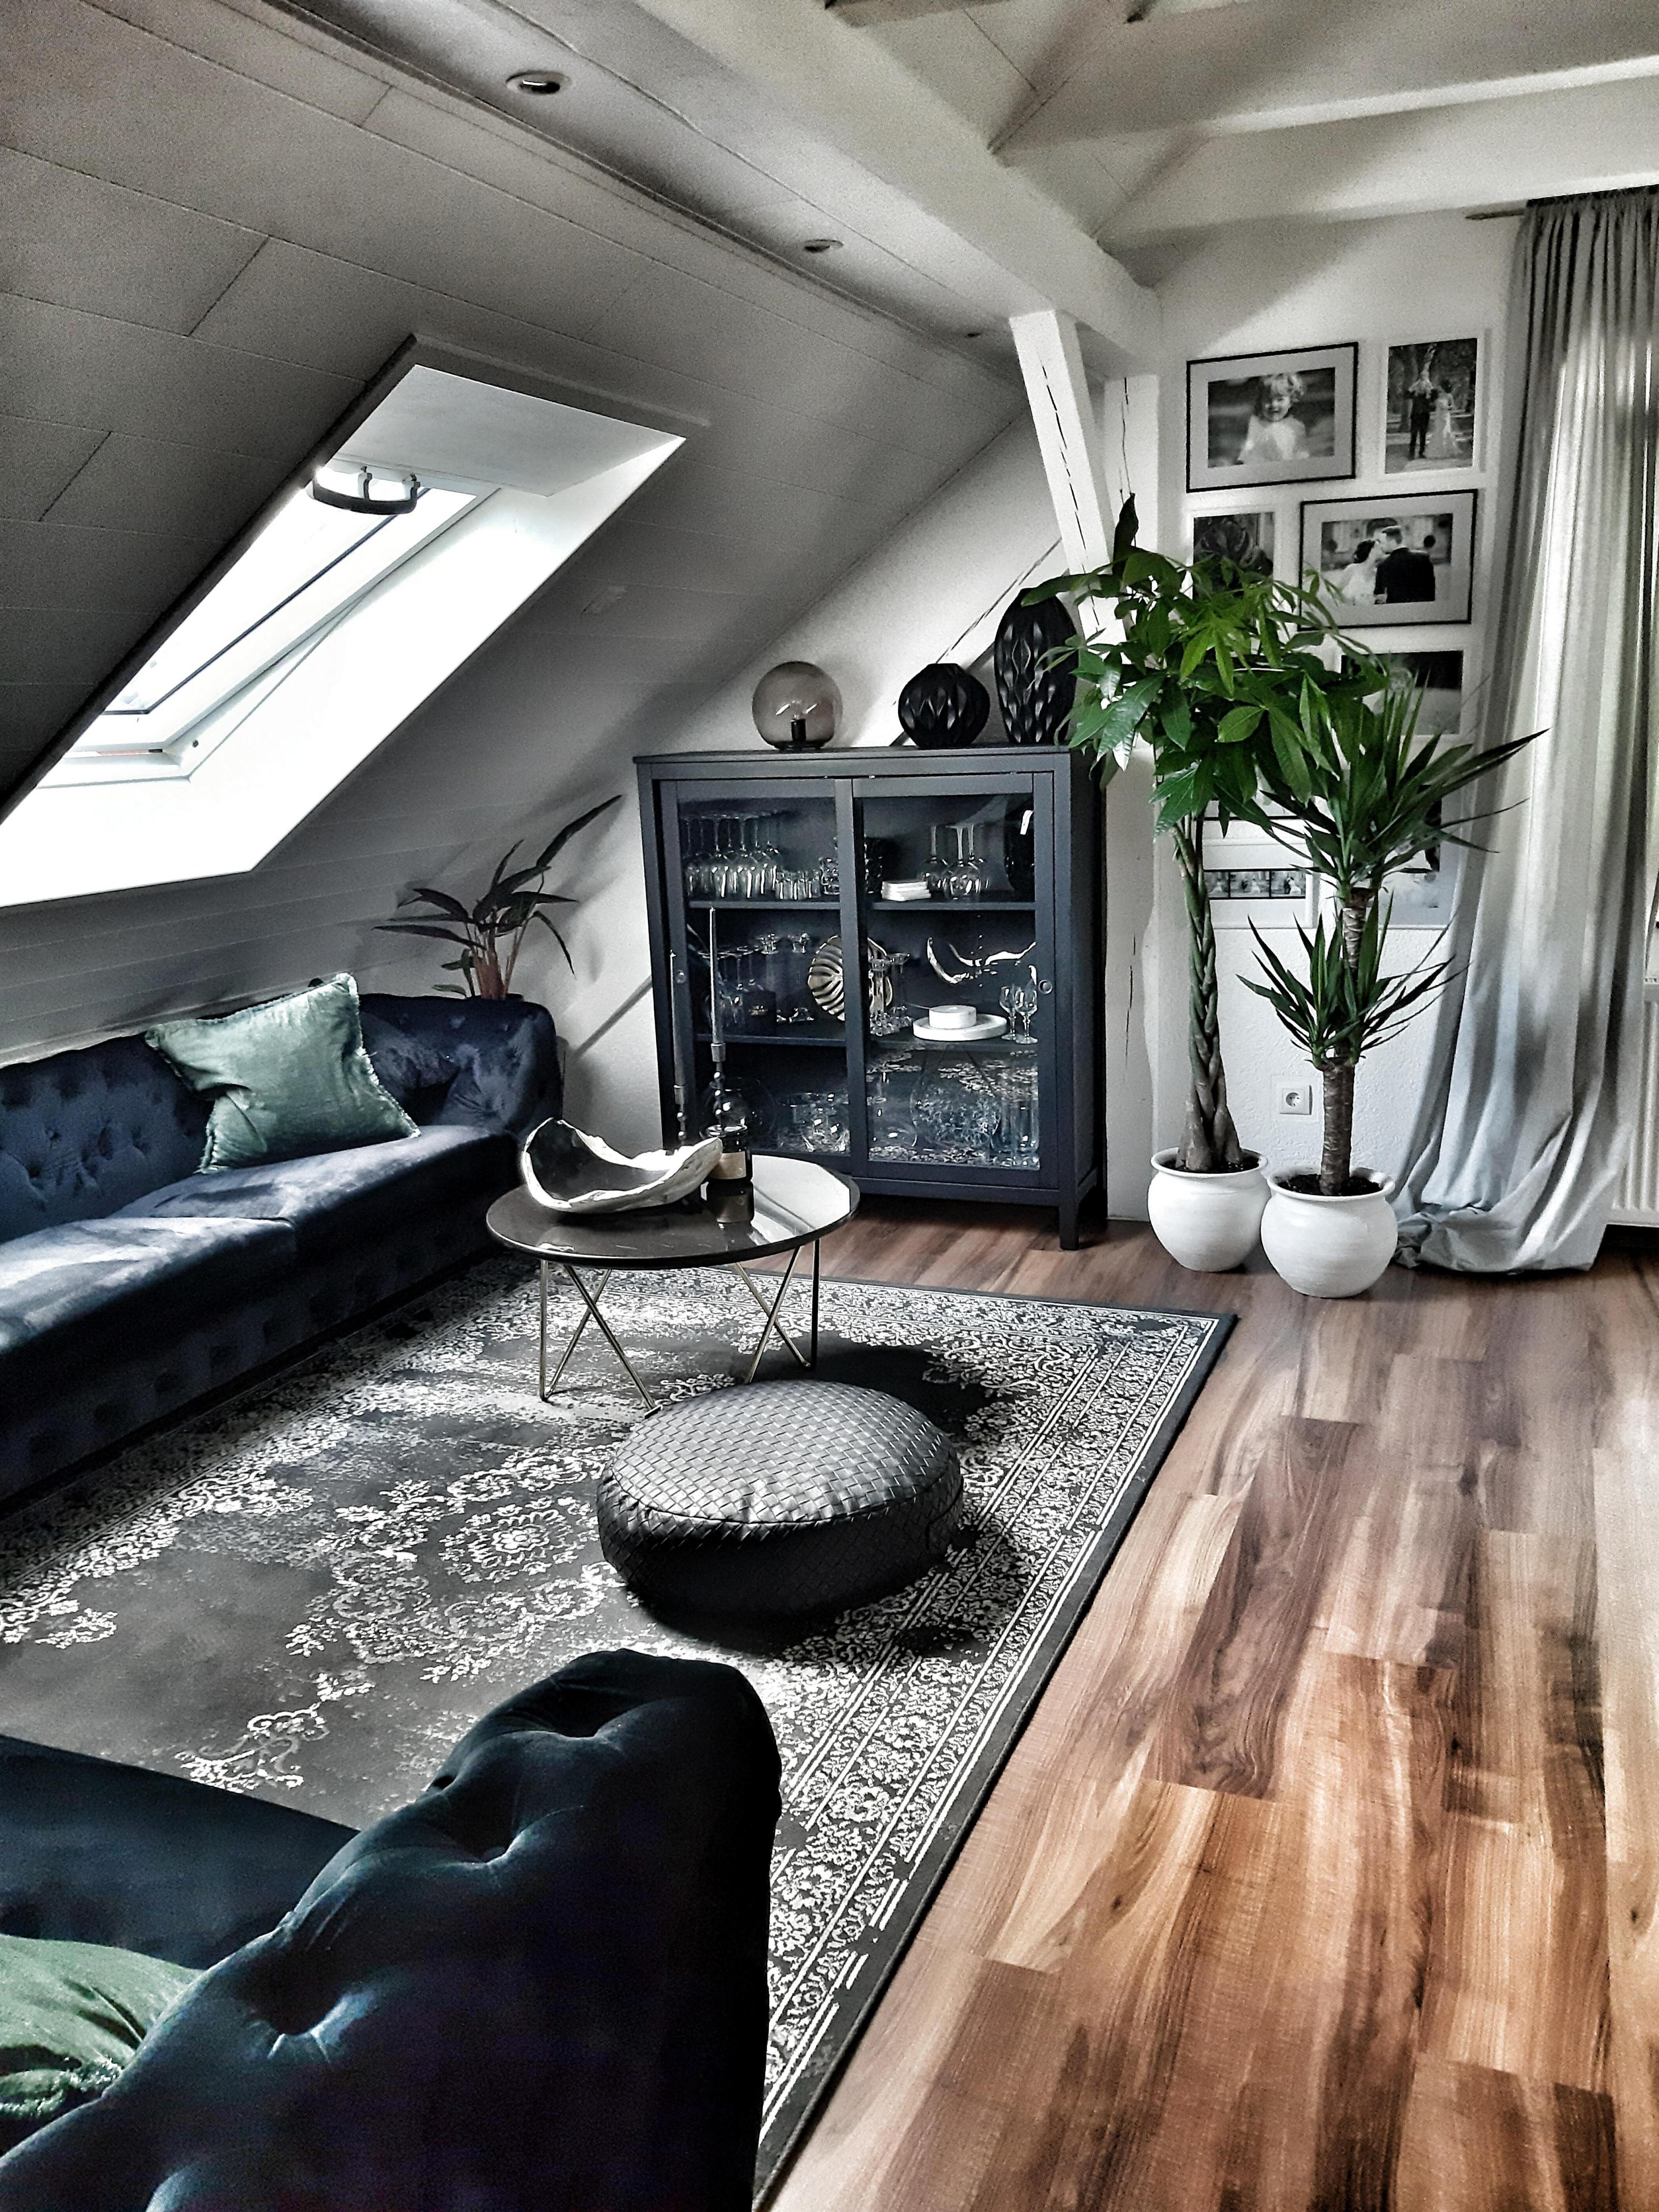 Dachgeschoss Schlafzimmer Ideen – Caseconrad von Dachgeschoss Wohnzimmer Einrichten Photo